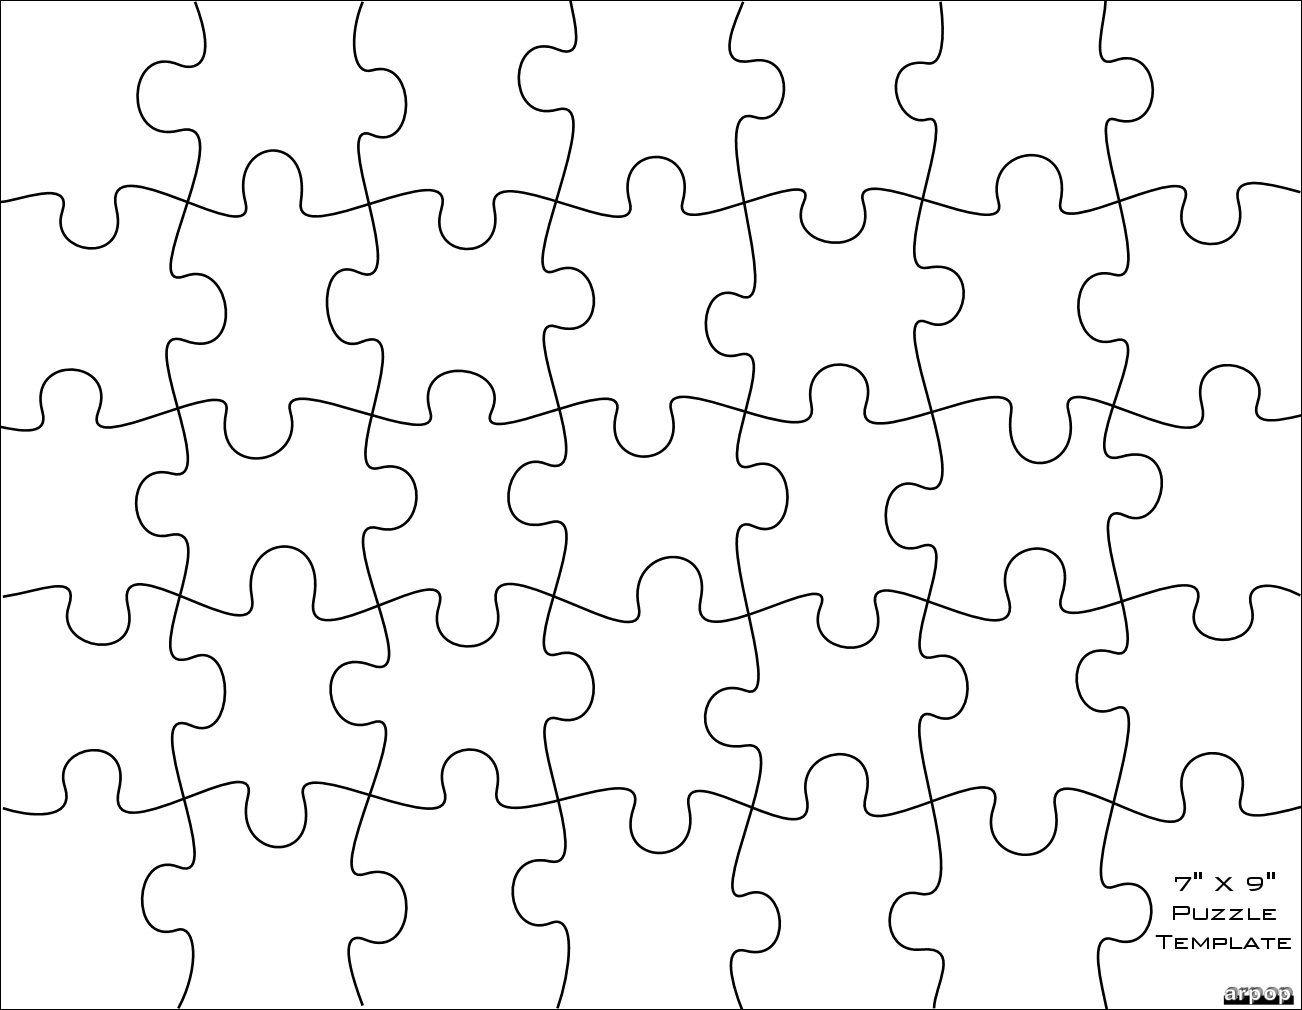 Free Scroll Saw Patternsarpop: Jigsaw Puzzle Templates | School - Printable Jigsaw Puzzle Template